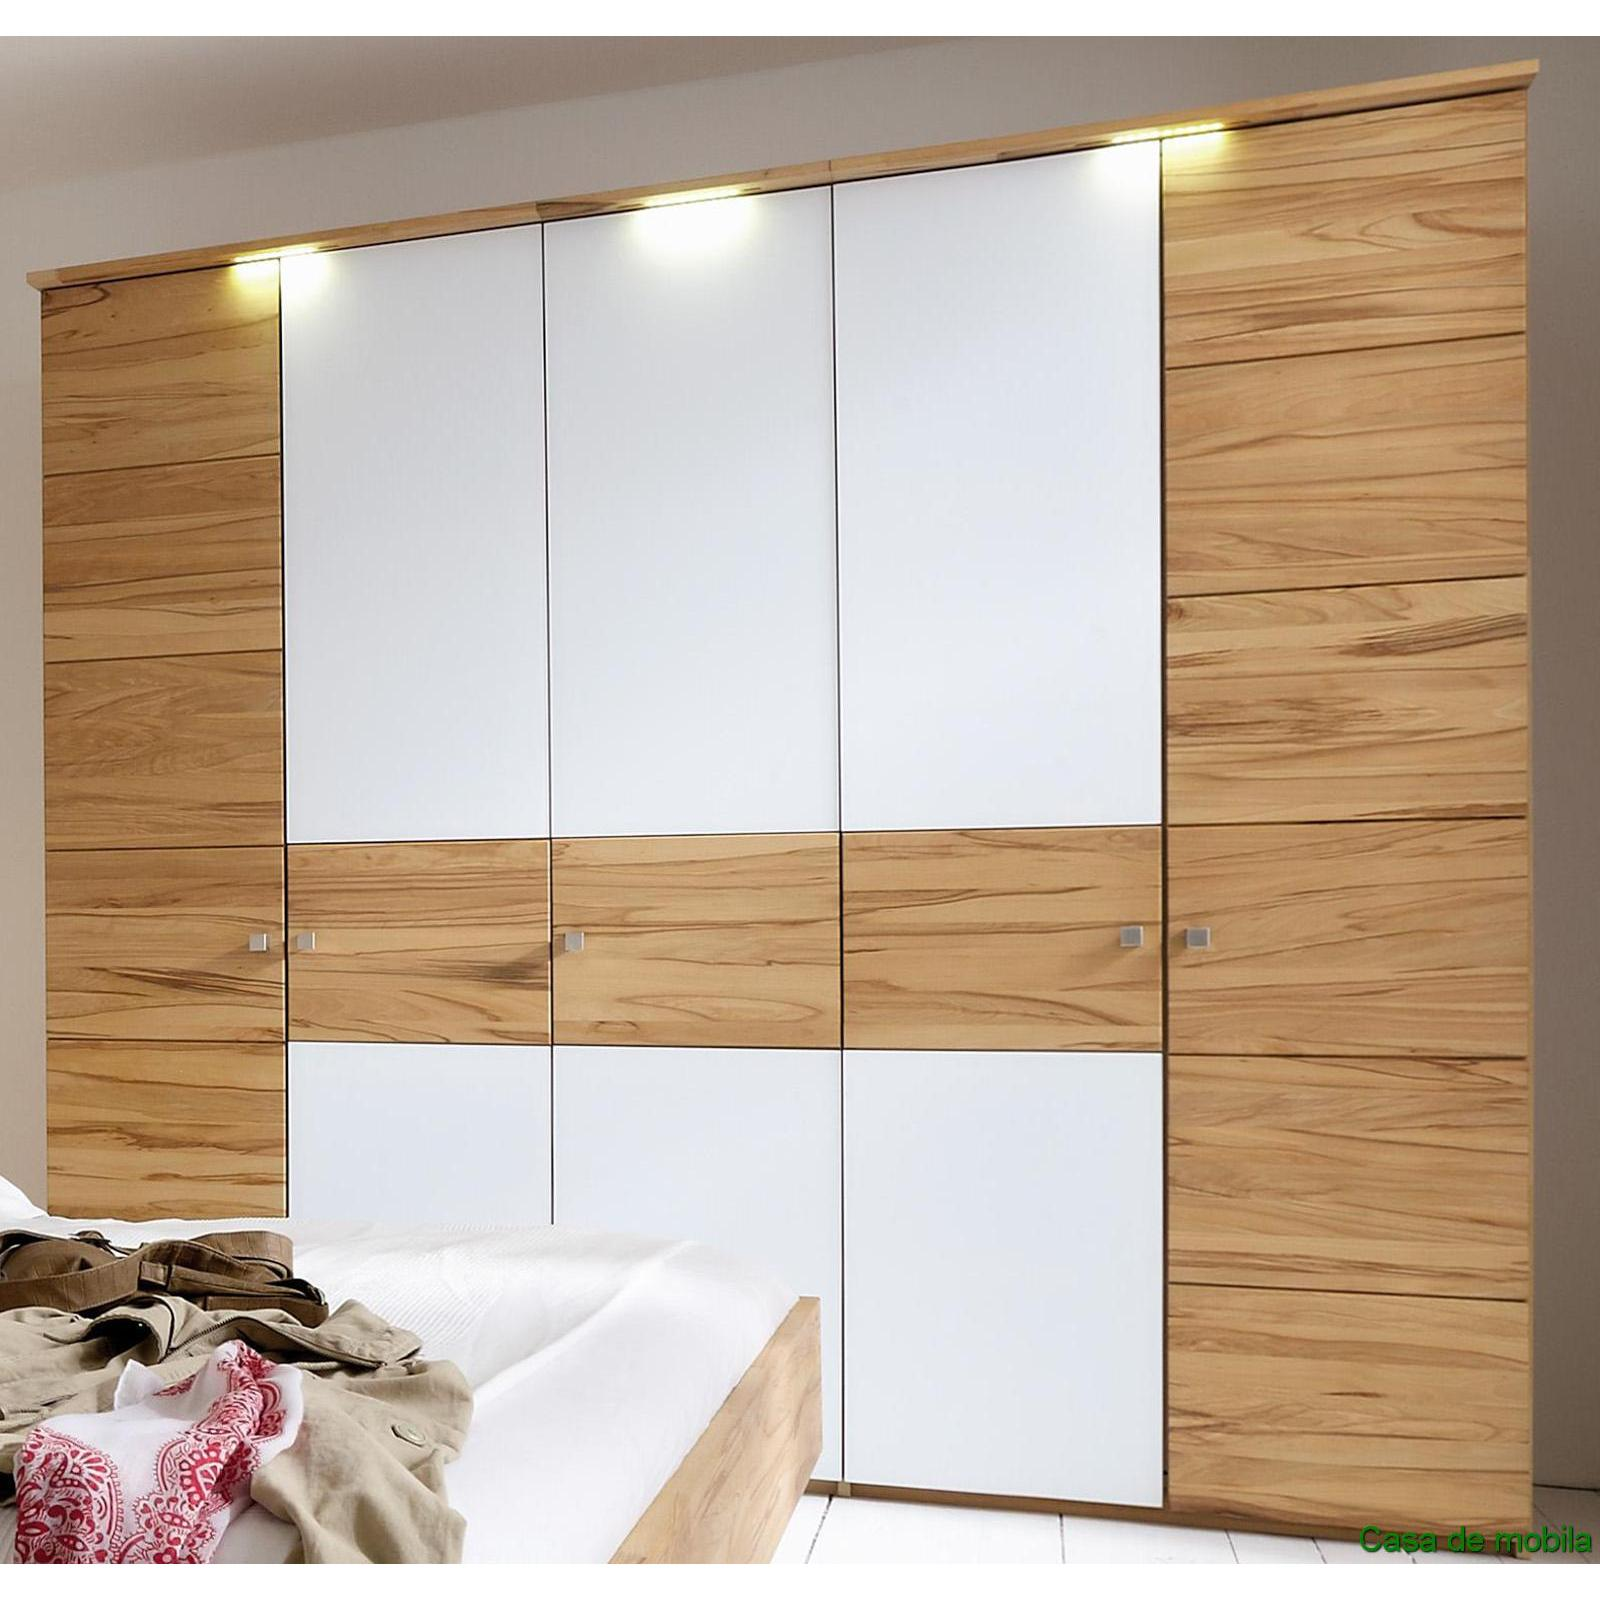 Echtholz schlafzimmer komplett kernbuche massiv ge lt mercur ii schwebebett 160x200 - Komplett schlafzimmer massiv ...